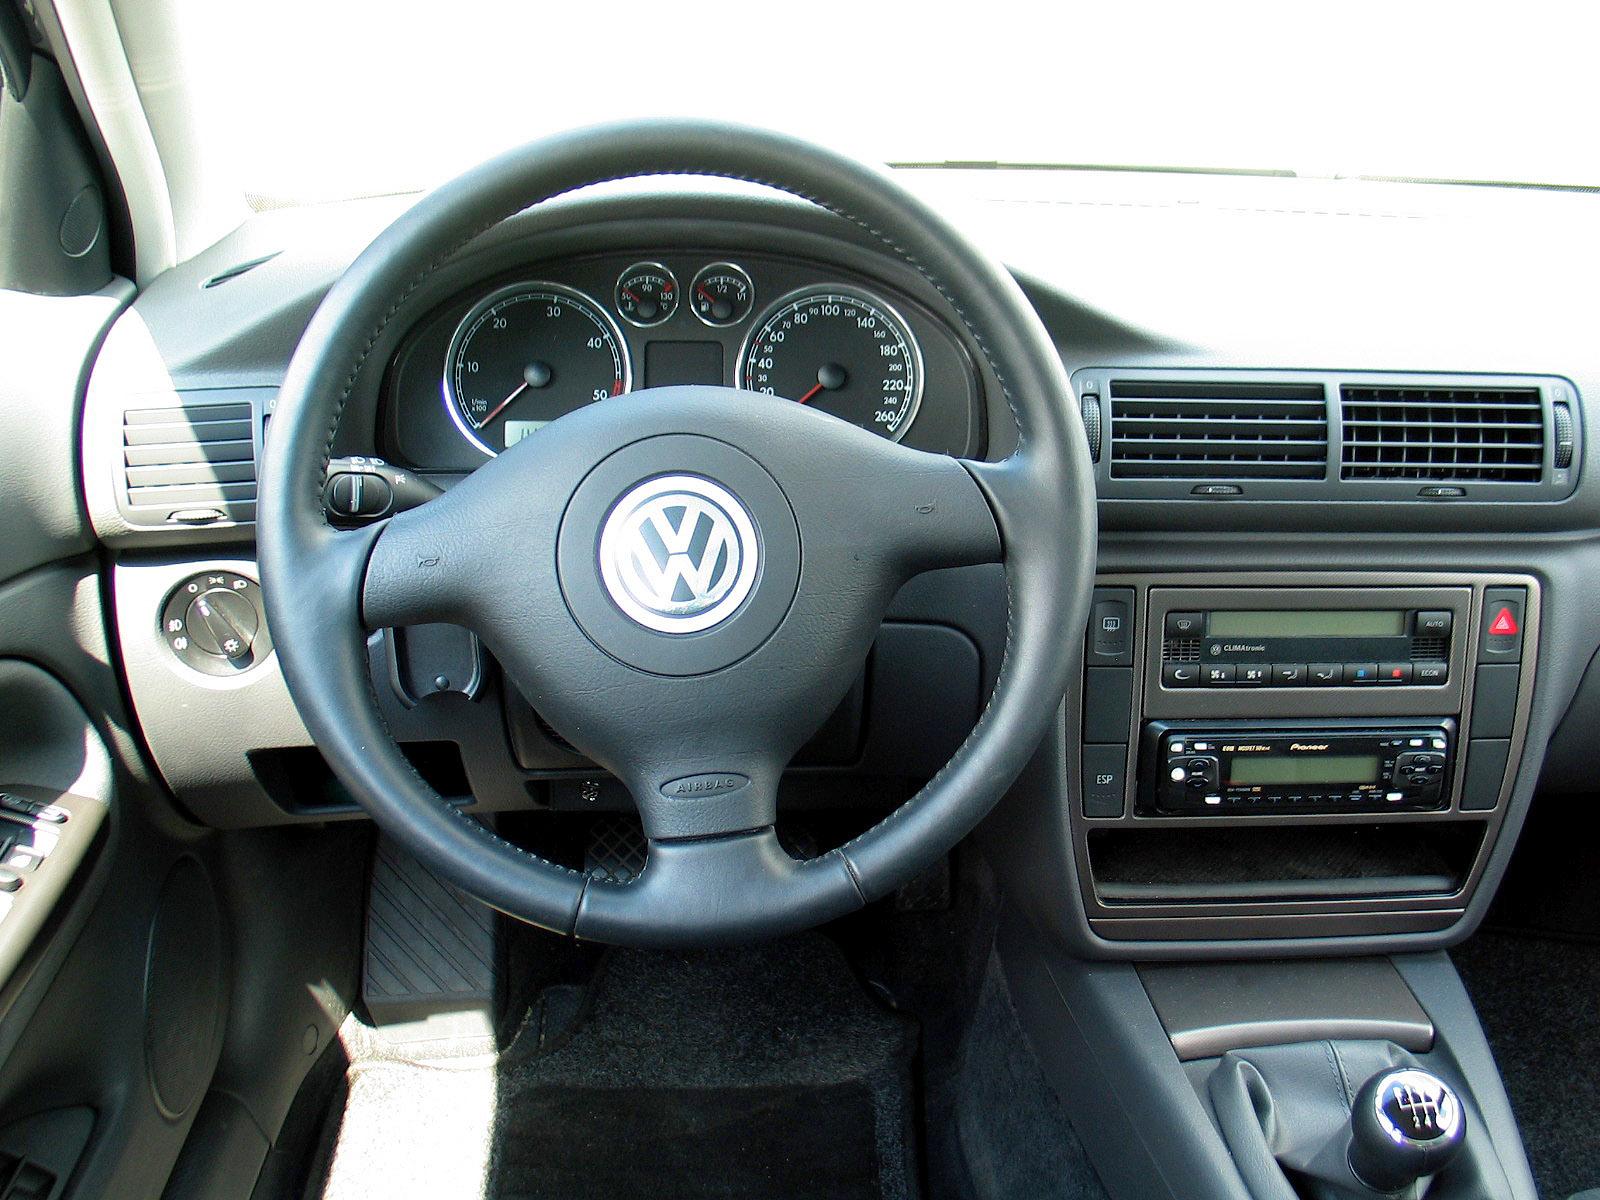 Moto pod pr d vw passat b5 1 8 turbo for Volkswagen passat 2000 interior